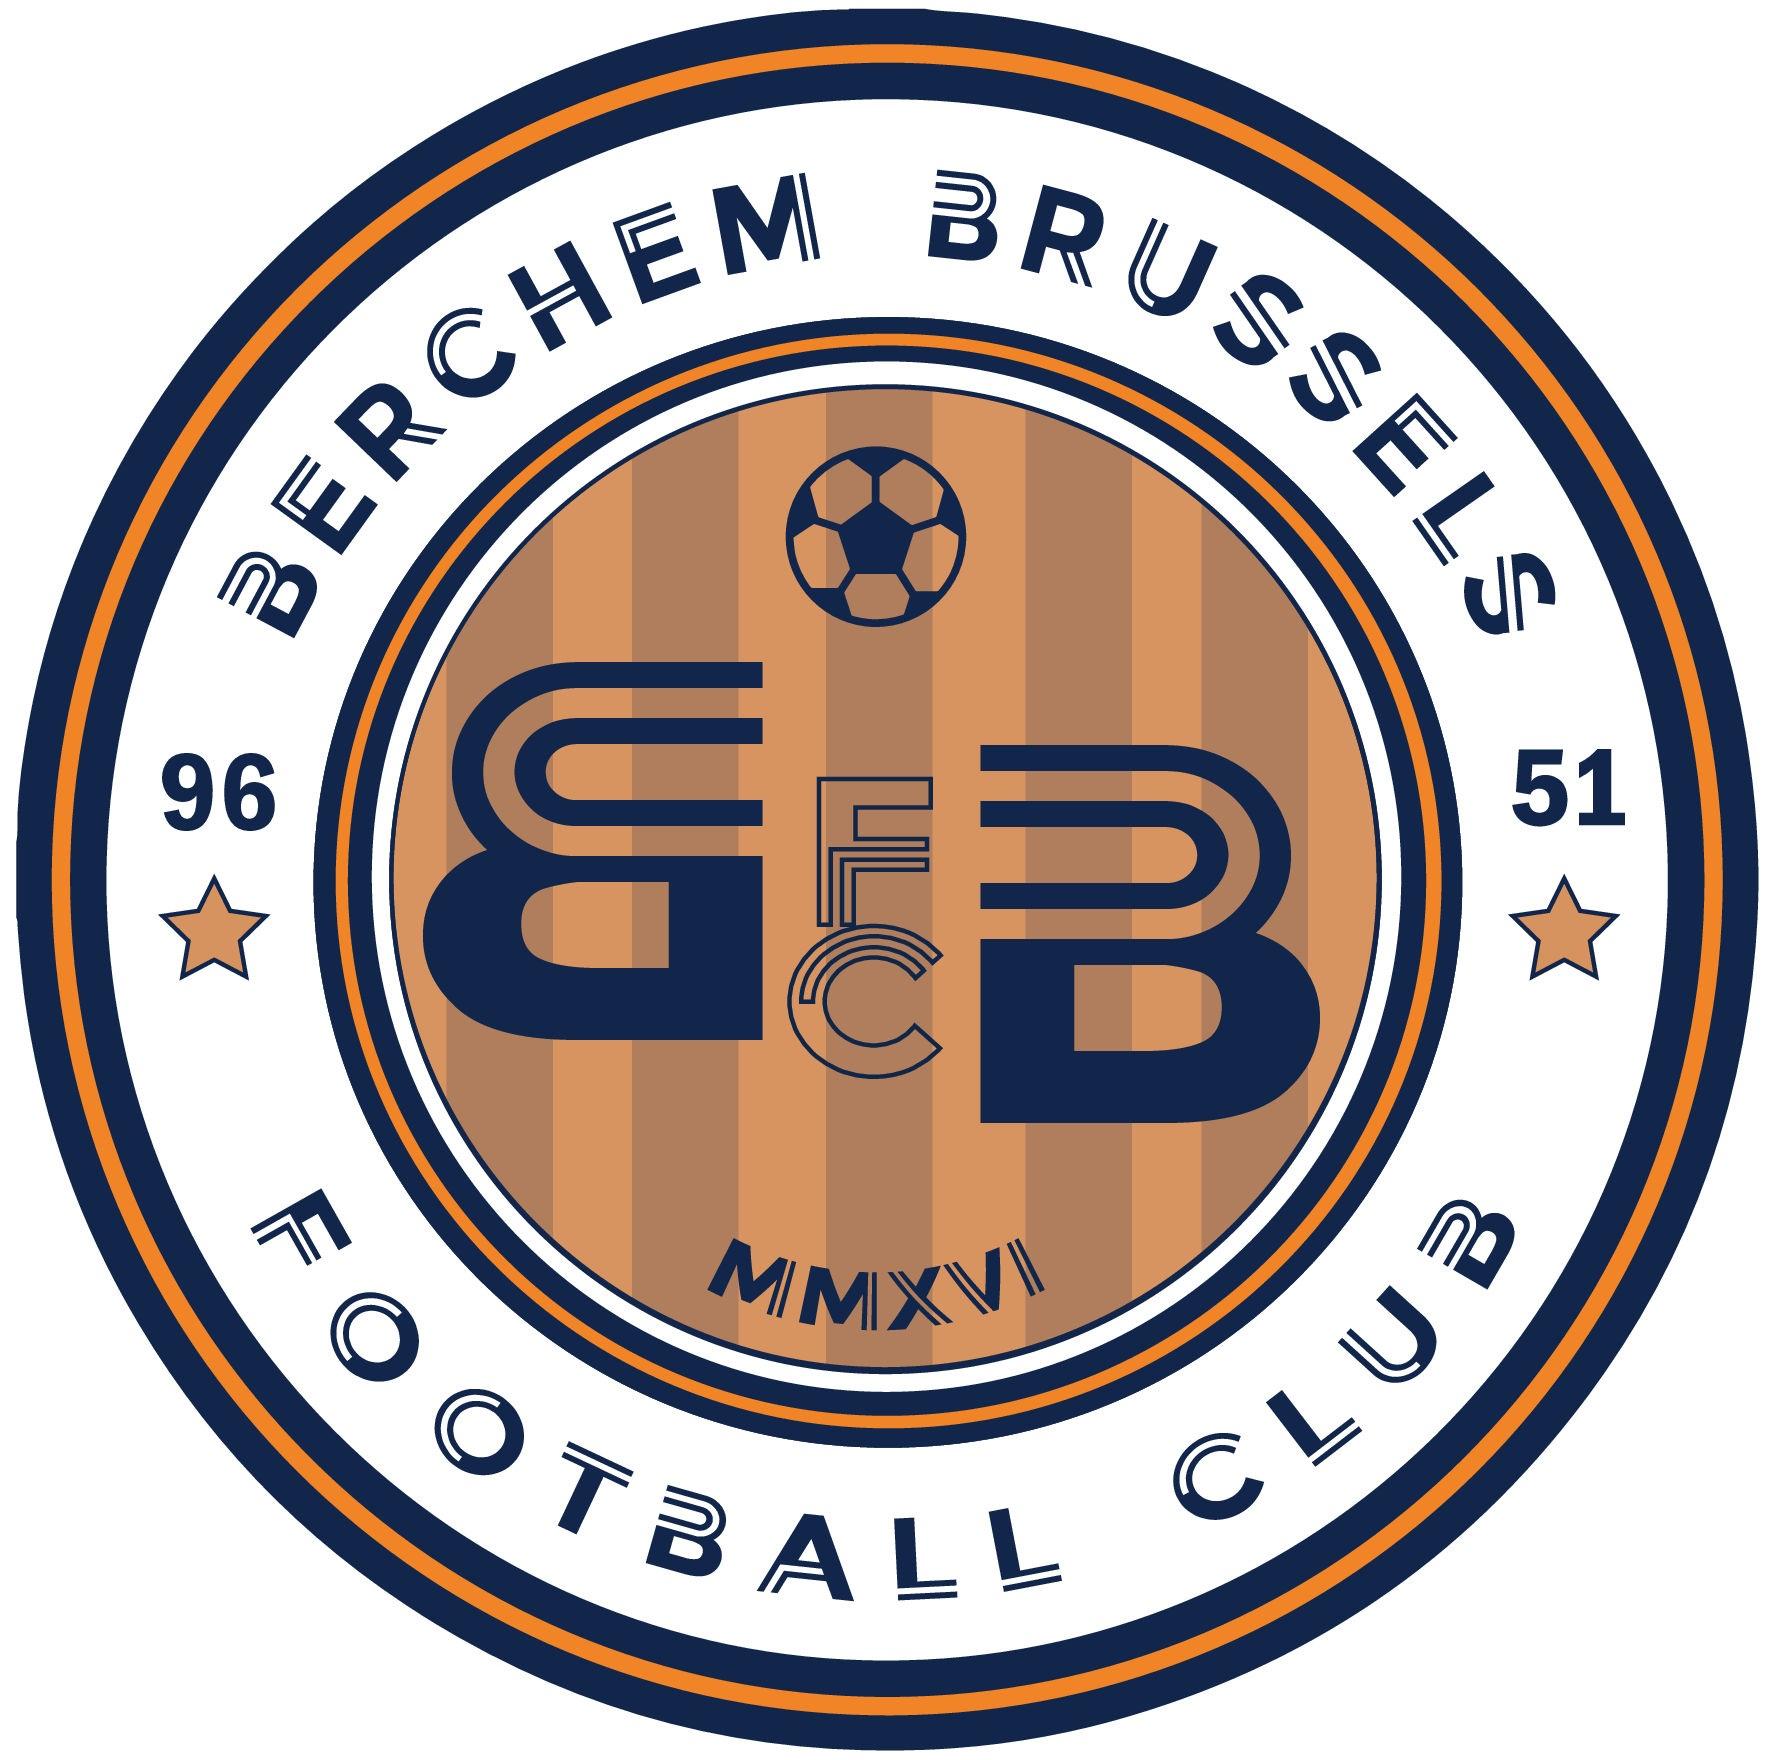 2 - Brussels Sport AFCA